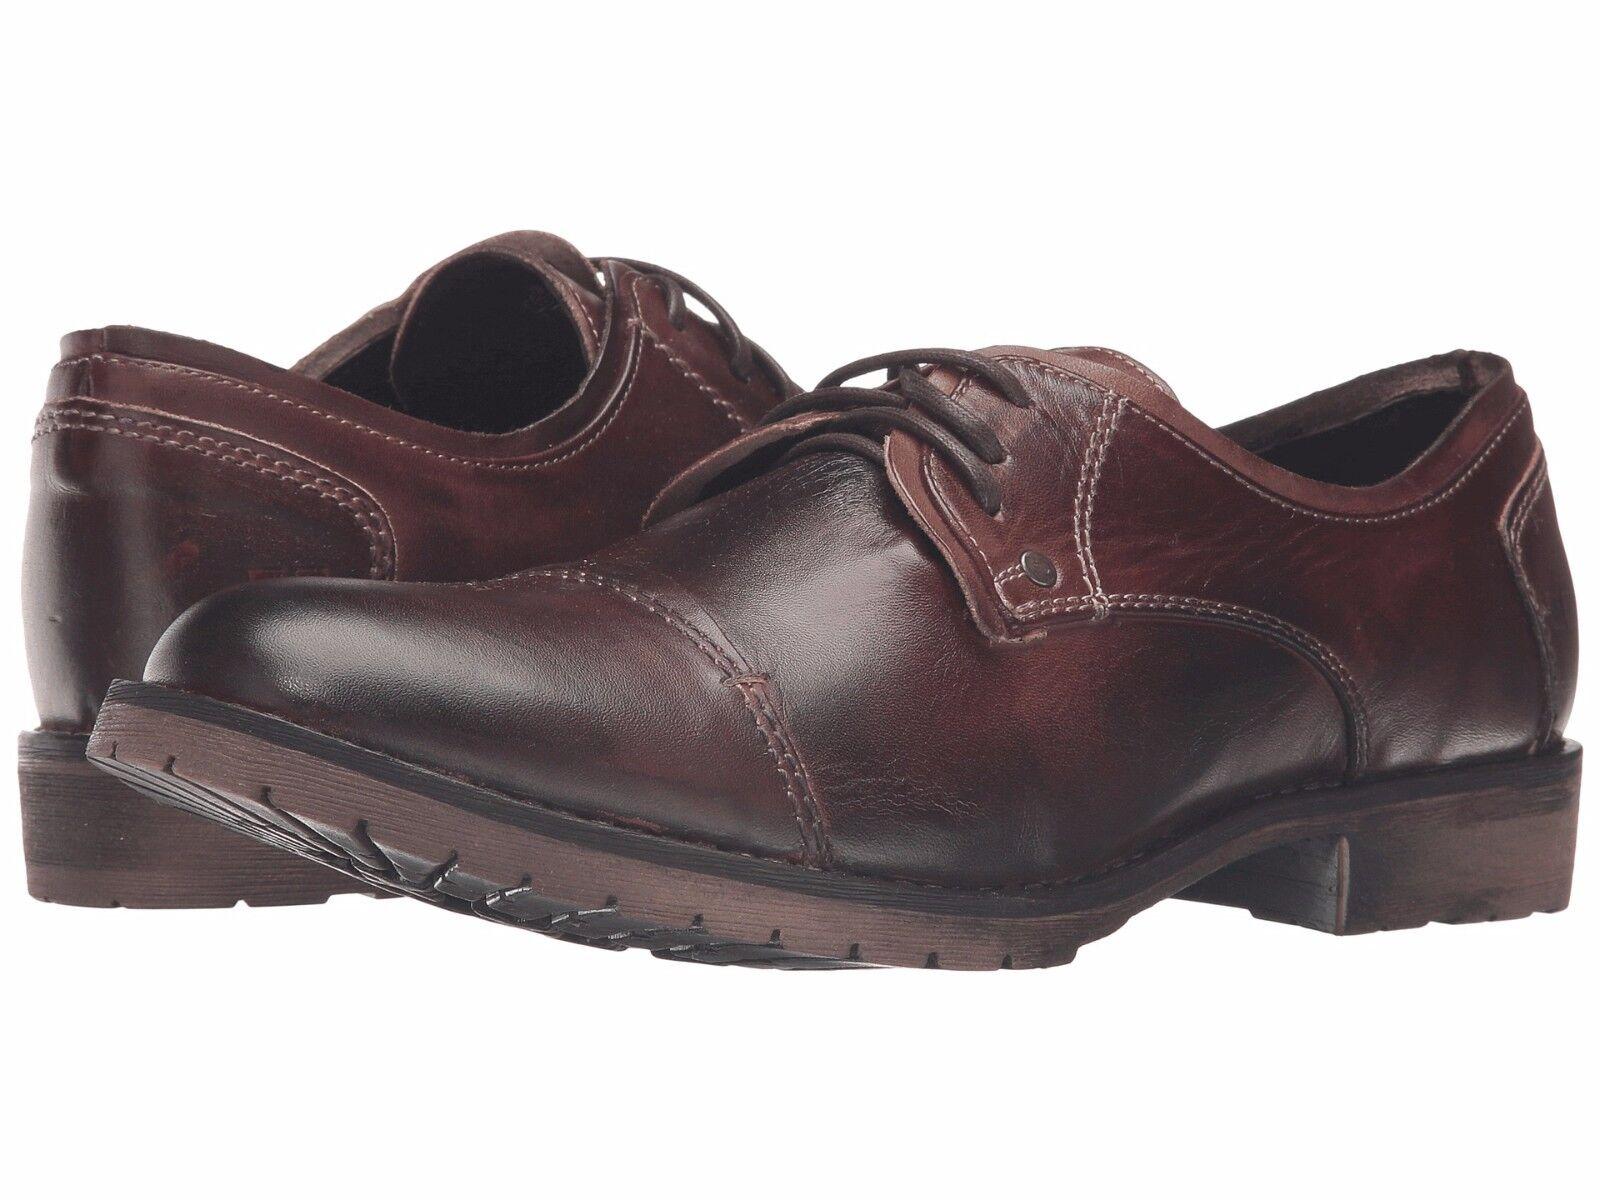 Men's Bed Stu Repeal Teak Rustic Leather Oxfords SZ 9.5 MSRP 150